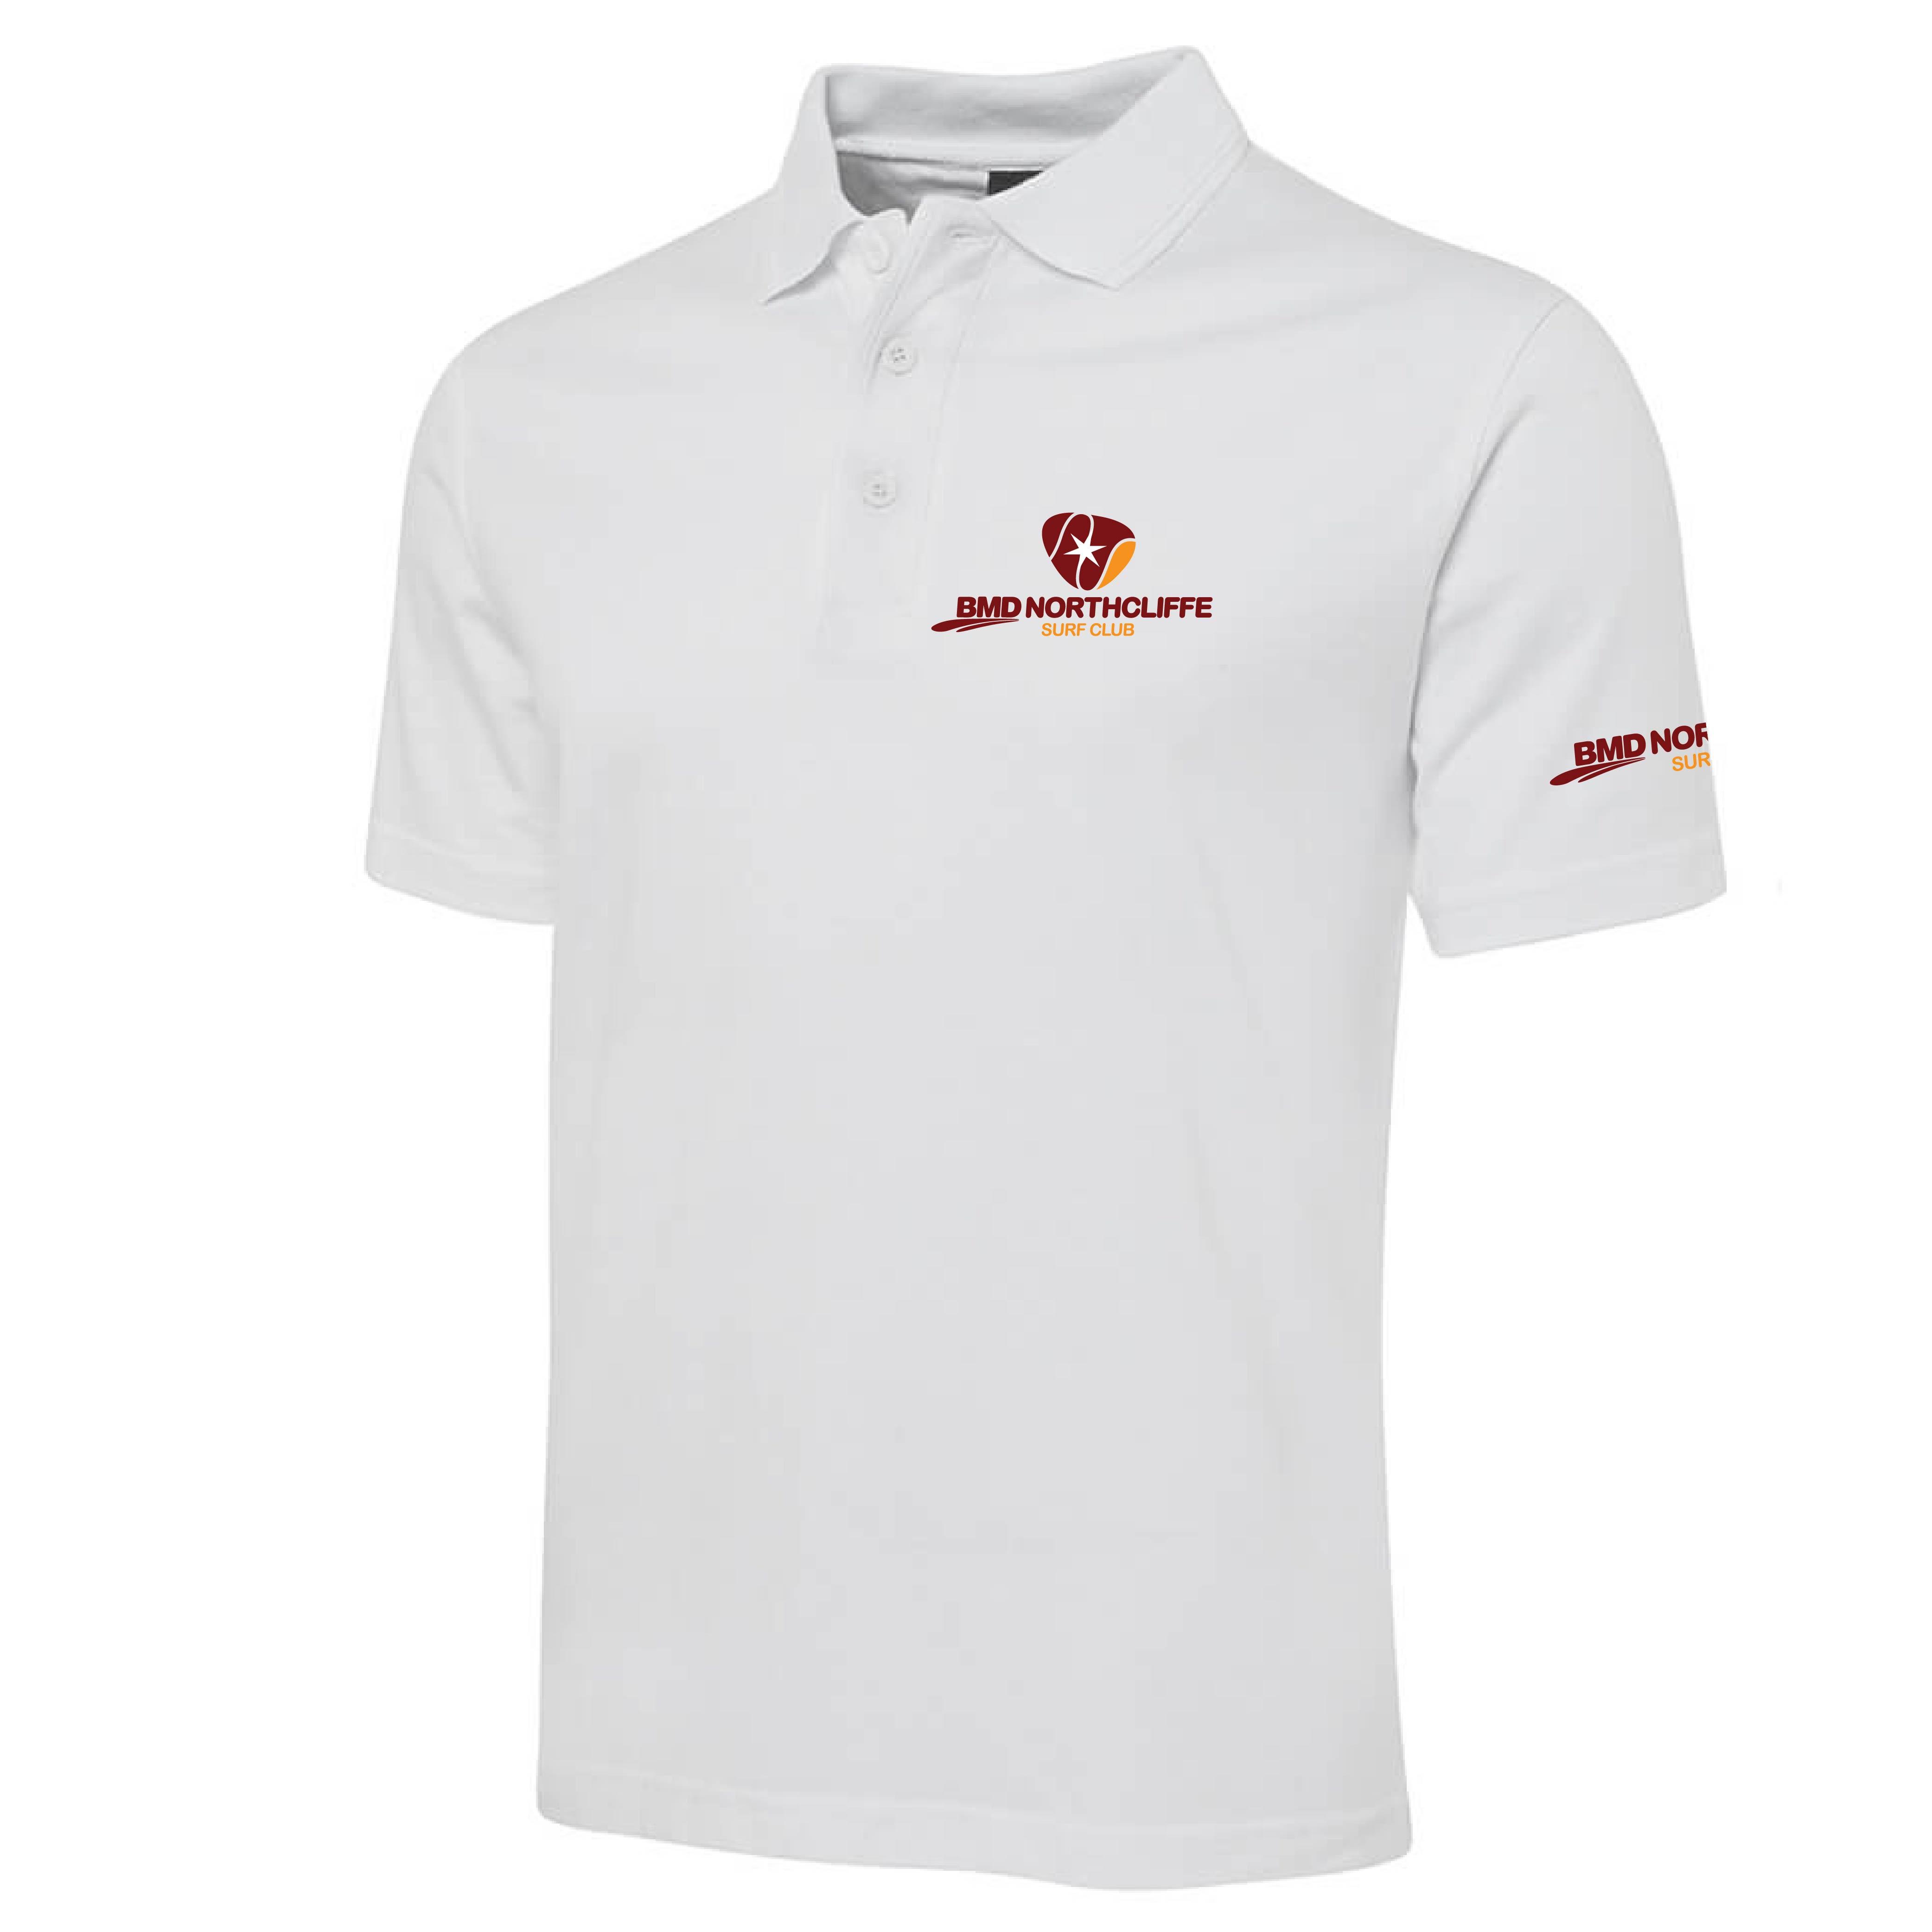 Custom Sublimated Polo Shirts | Sublimated Teamwear | Team Elite